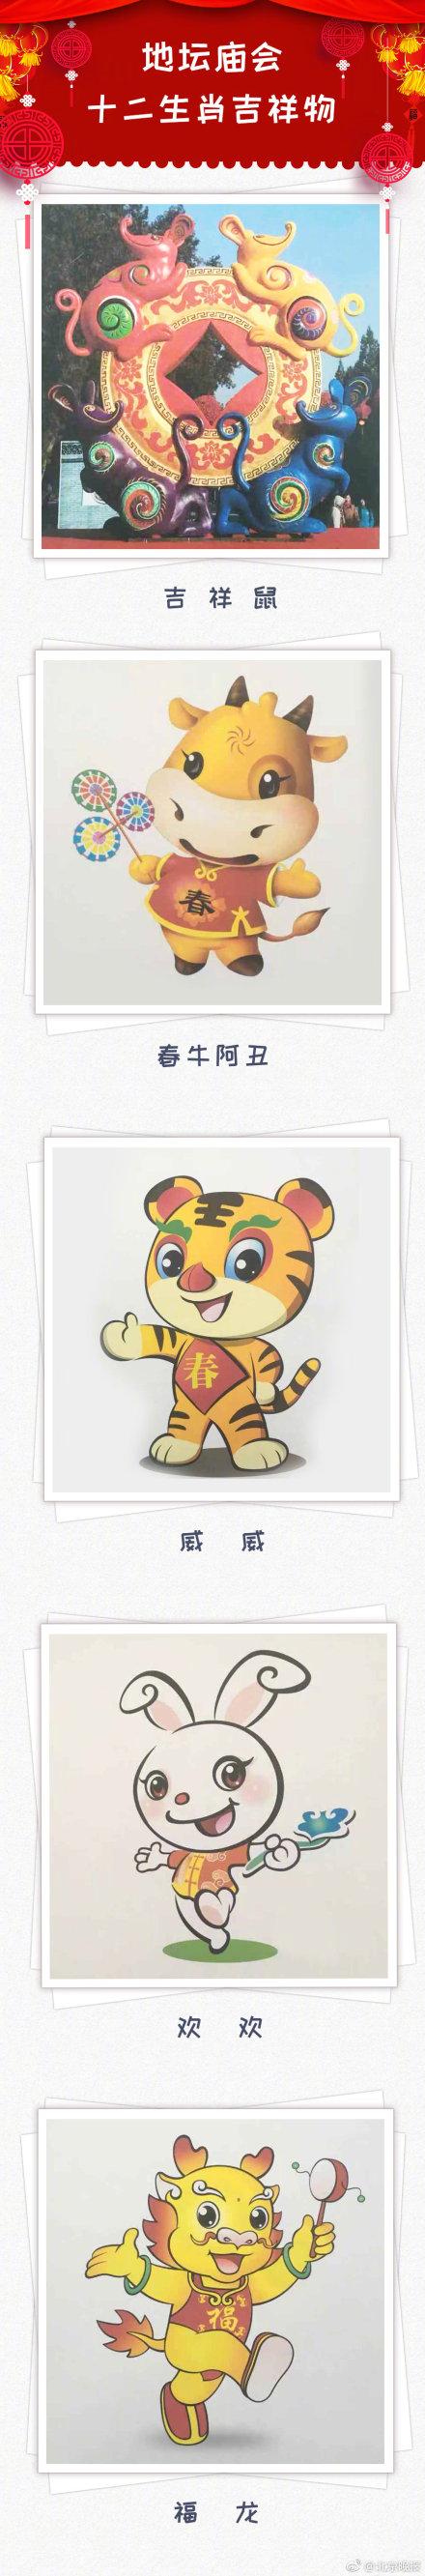 2O19年地坛春节文化庙会十二生肖吉祥物公布